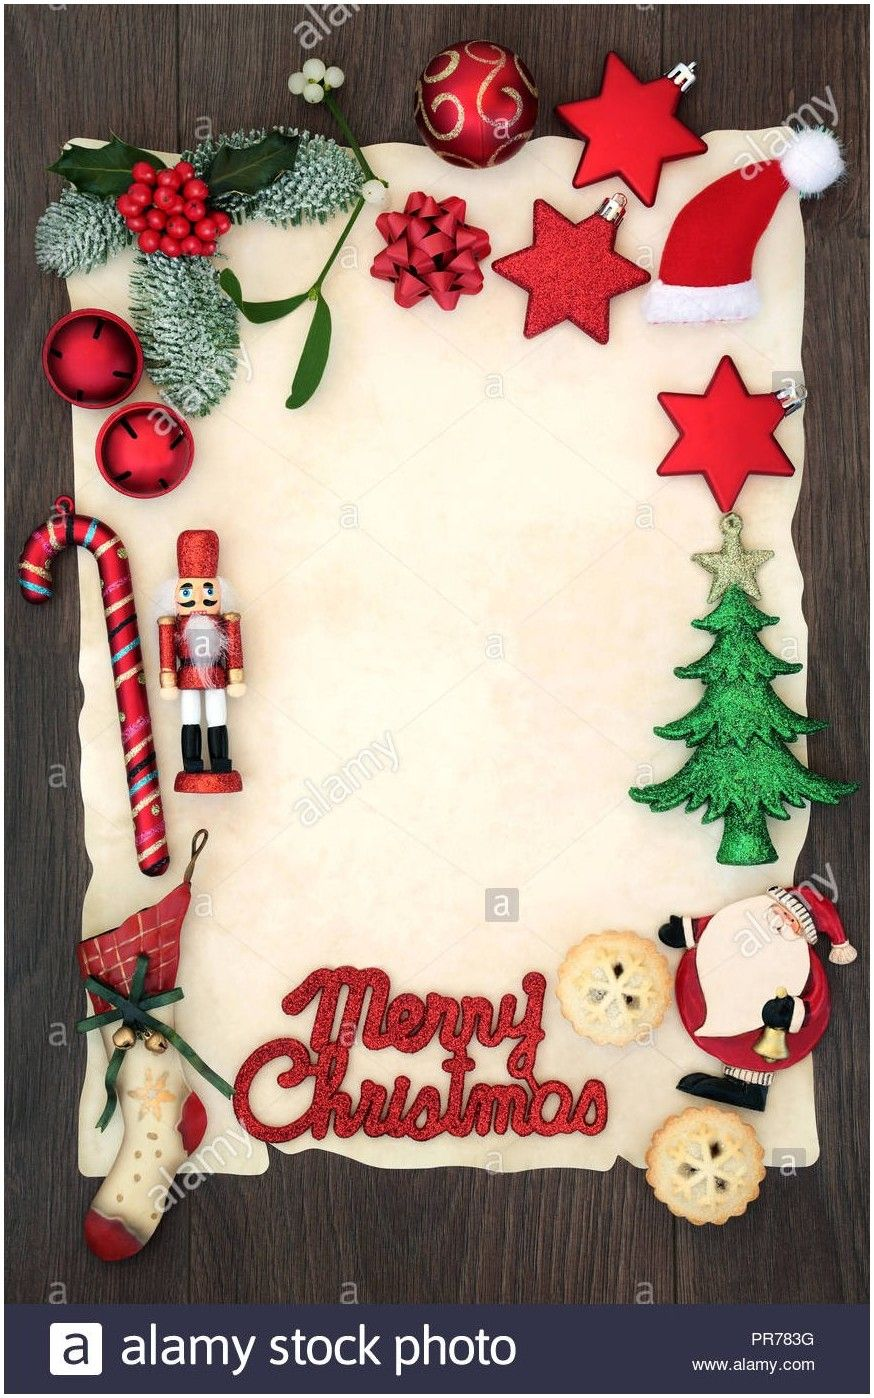 Christmas Border Paper Template Christmas Border Cross